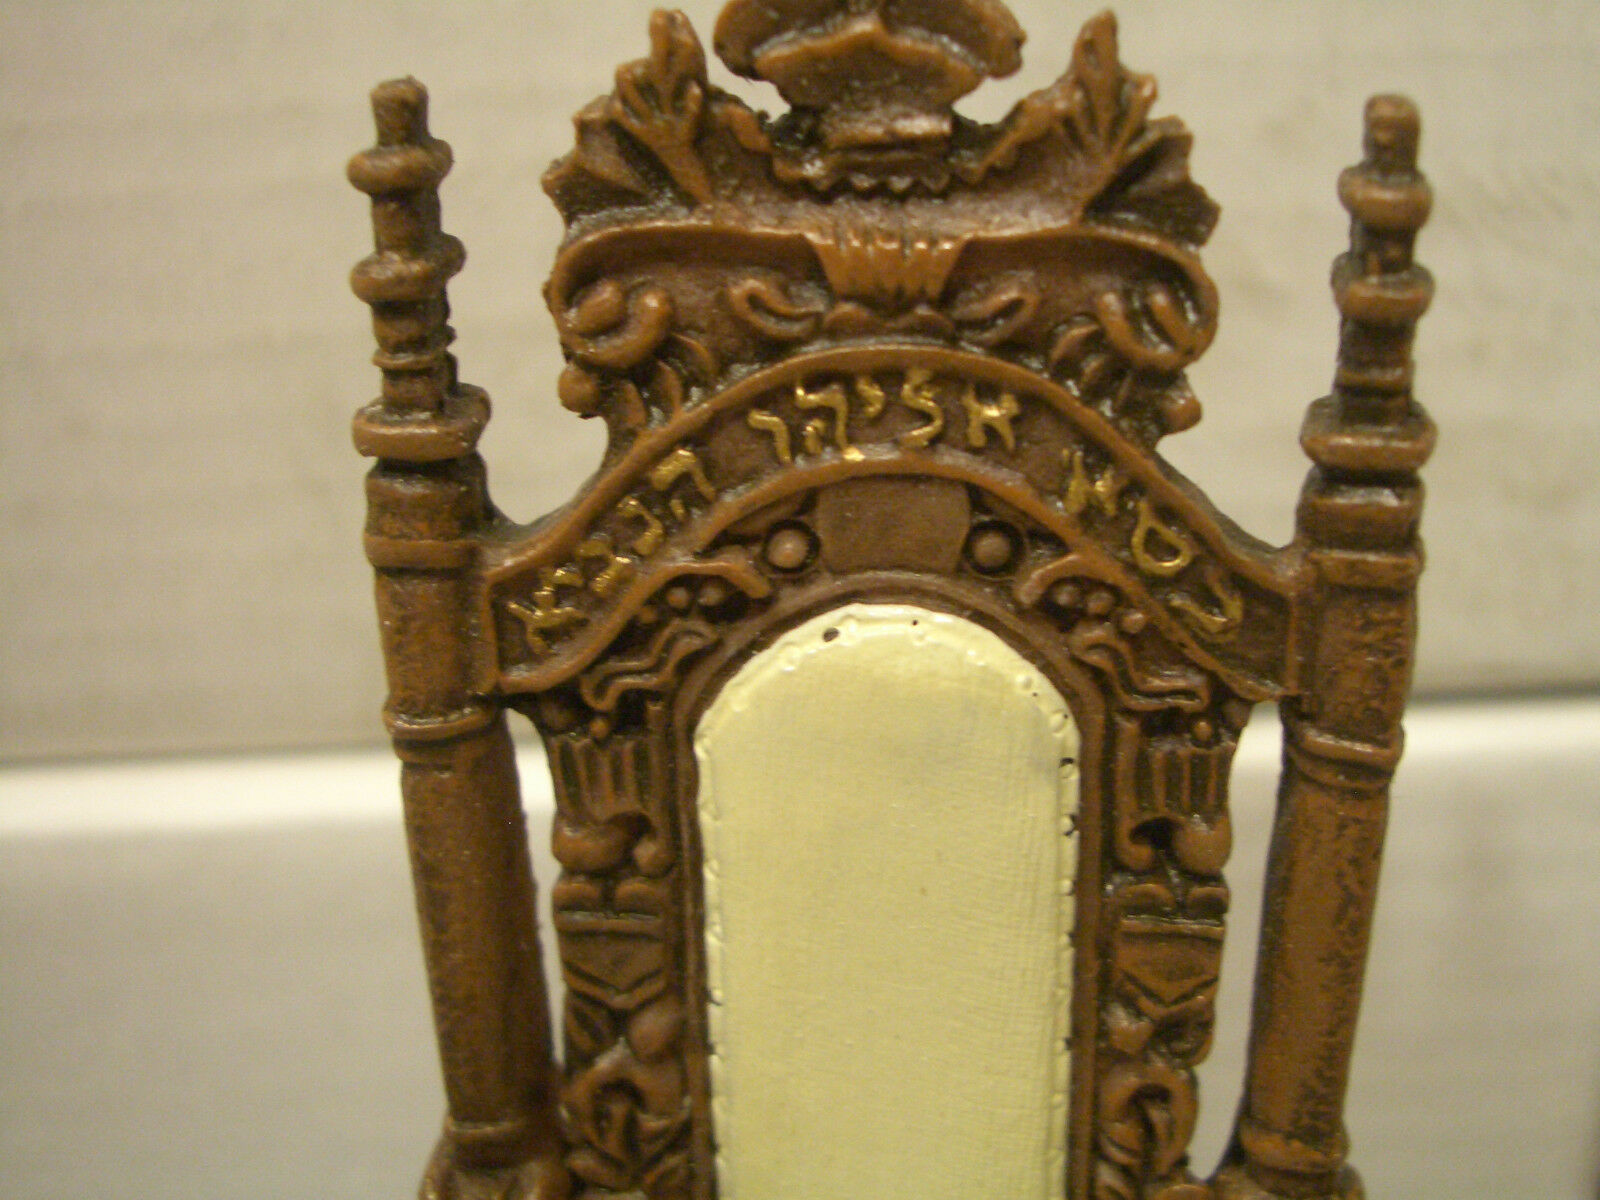 DOLLHOUSE HEBREW, JEWISH, ISRAEL, JERUSALEM ORNATE DINING CHAIRS(CASE 24)DD-04IL